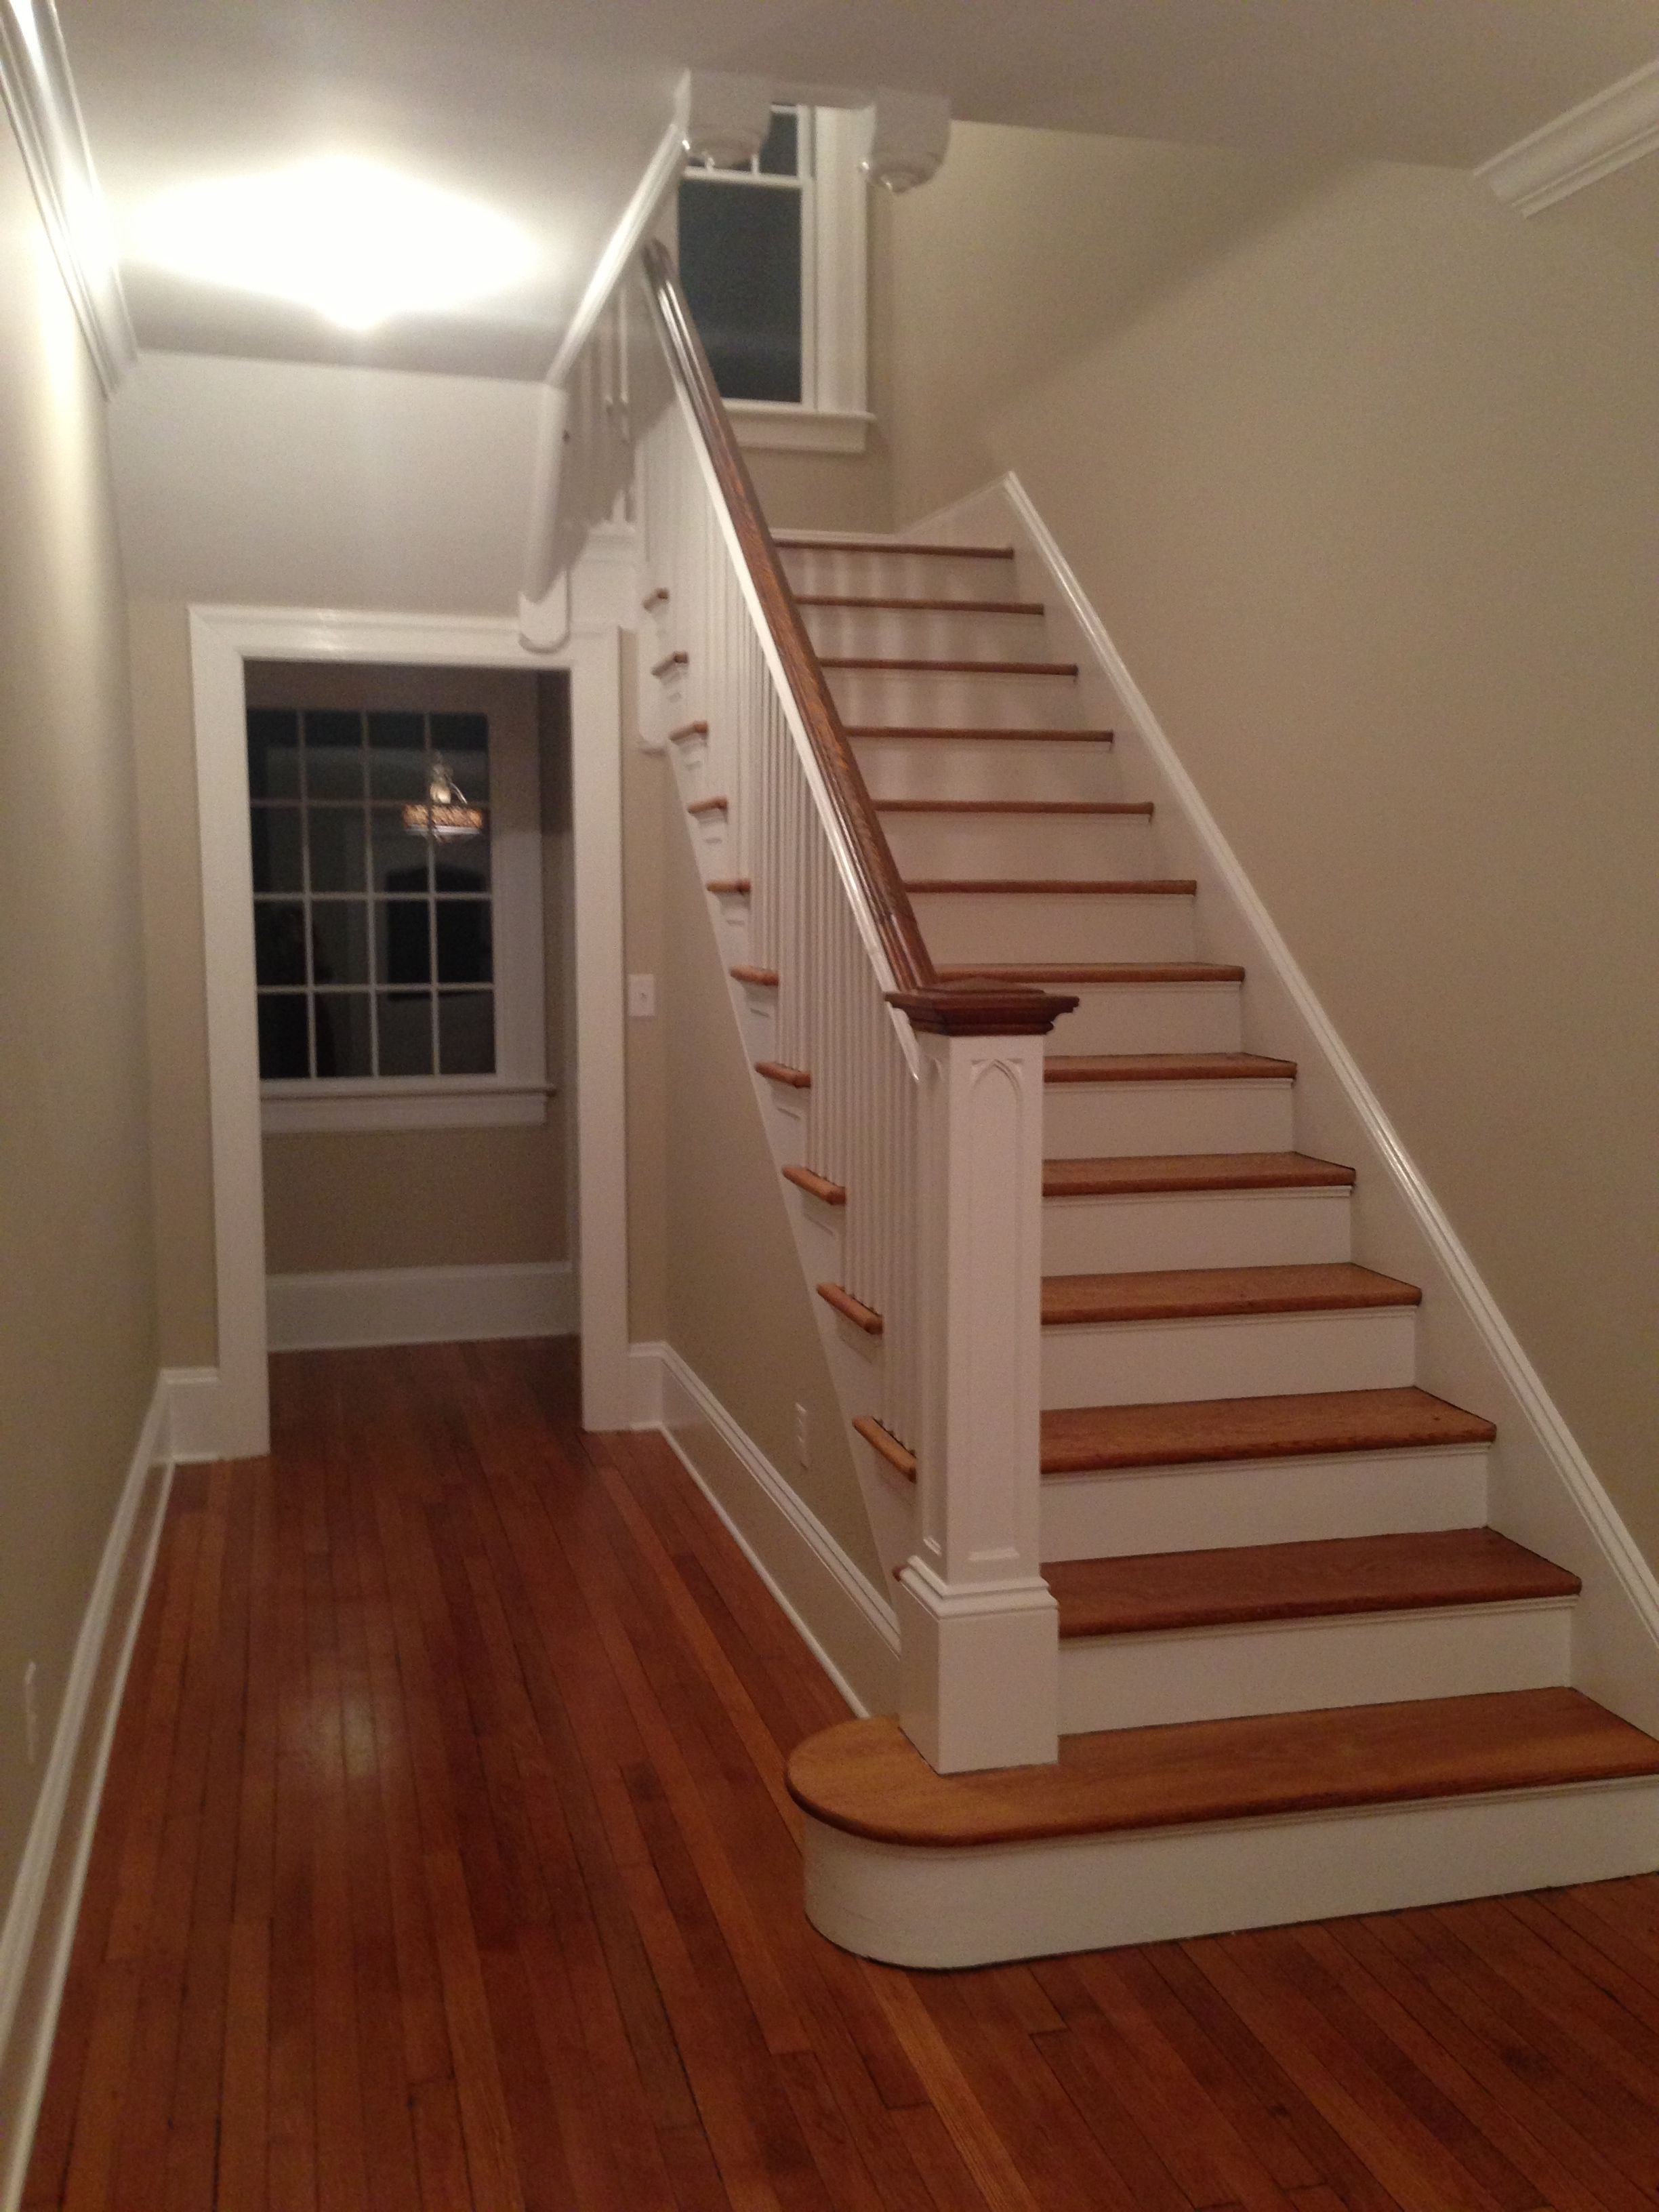 Benjamin moore litchfield gray paint colors for the home - Exterior paint colors benjamin moore ...